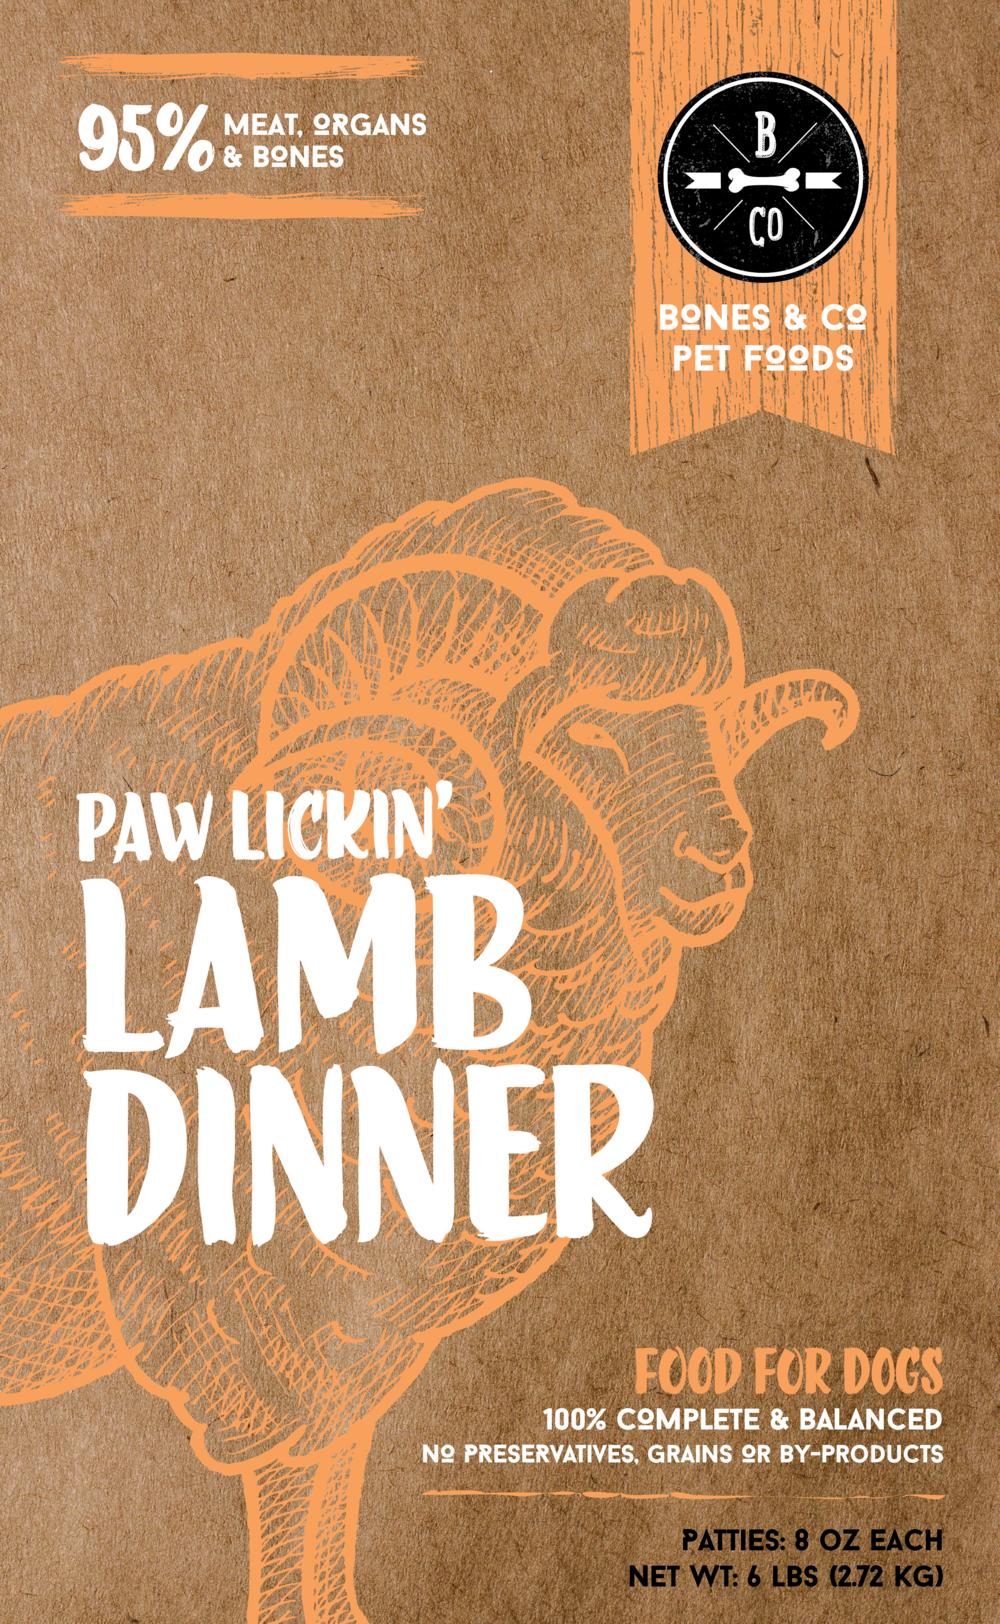 Bones & Co Paw Lickin' Lamb Dinner 8oz Patties Frozen Dog Food, 6-lb